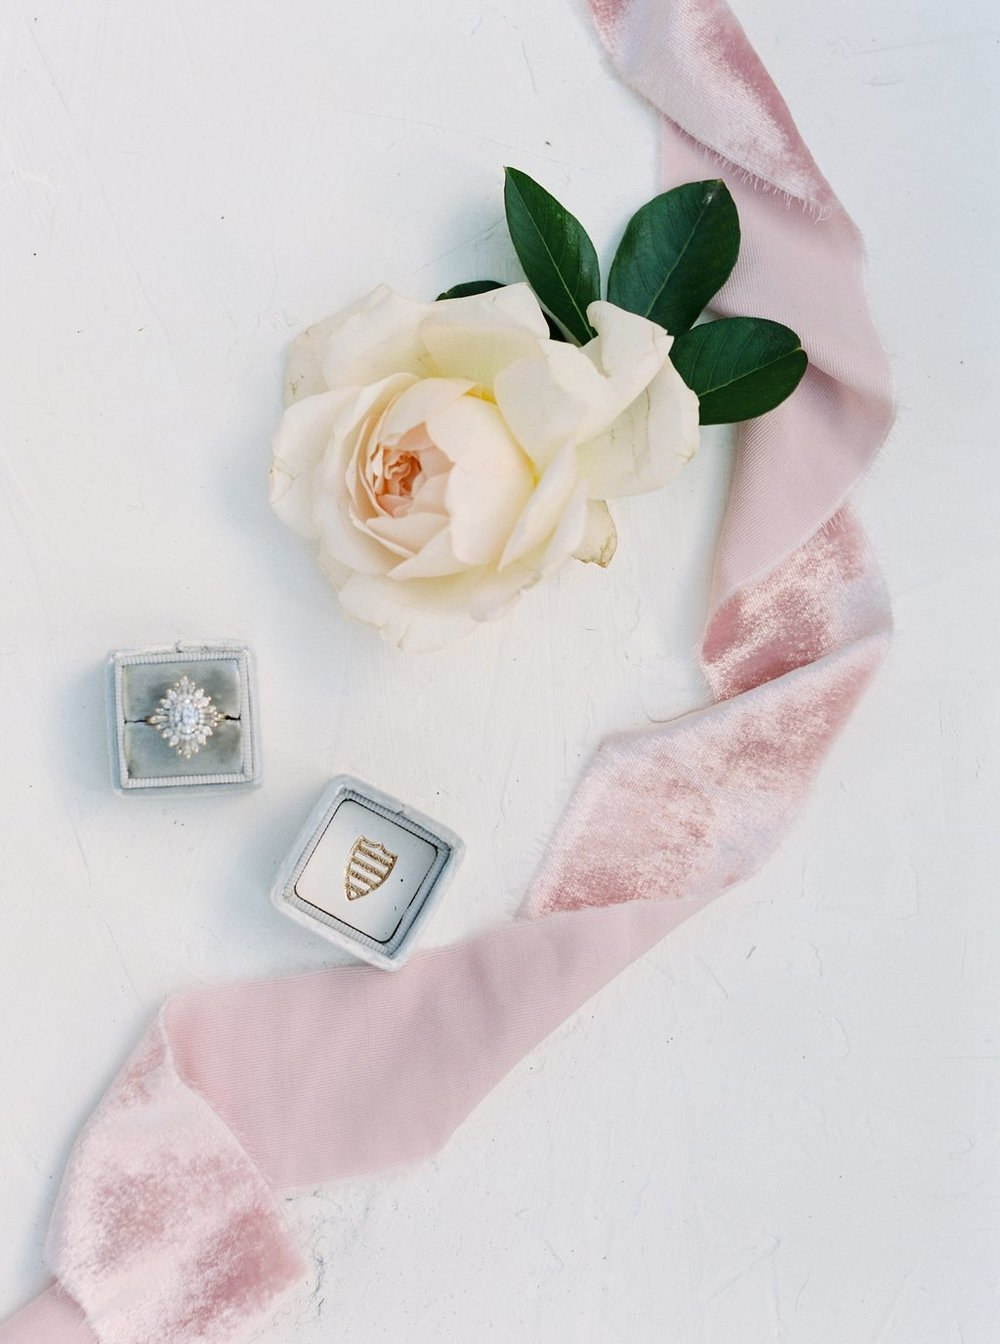 Wedding Ring flatlay photo inspirations